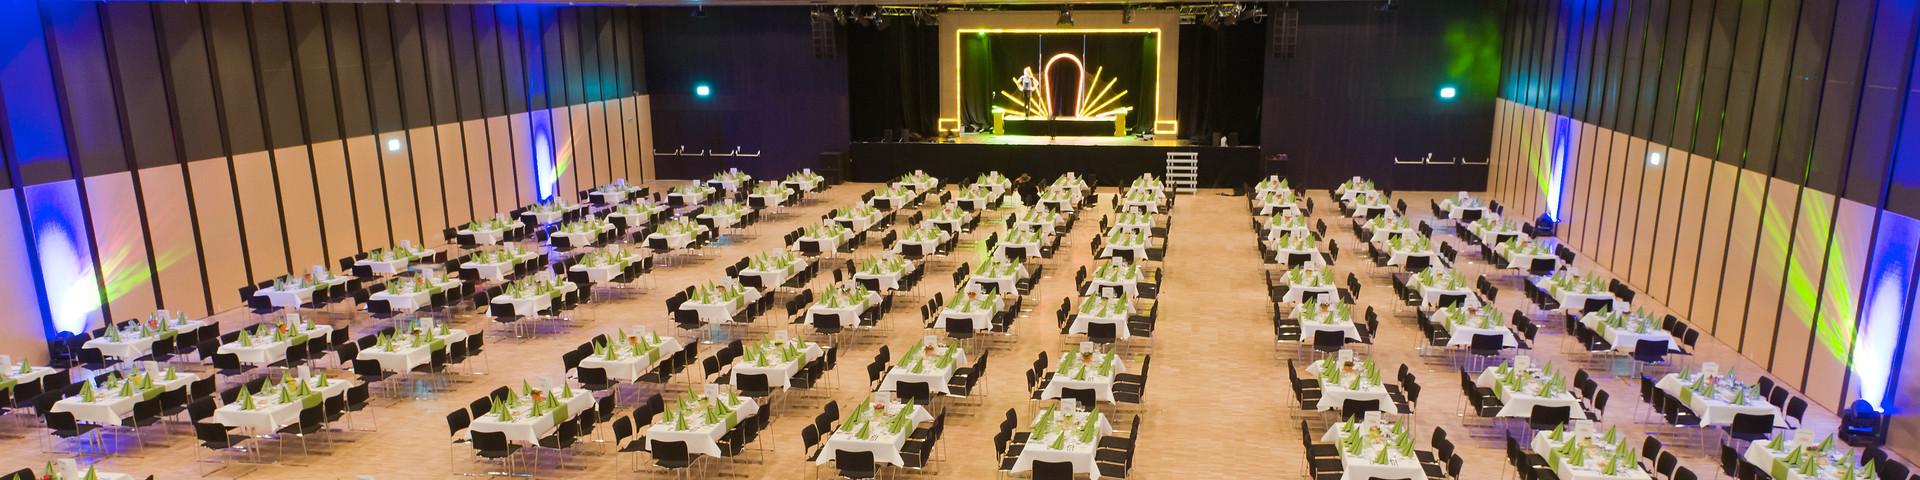 Congress Messe Innsbruck - Saal Forum 1_Standort Messe Innsbruck © CMI